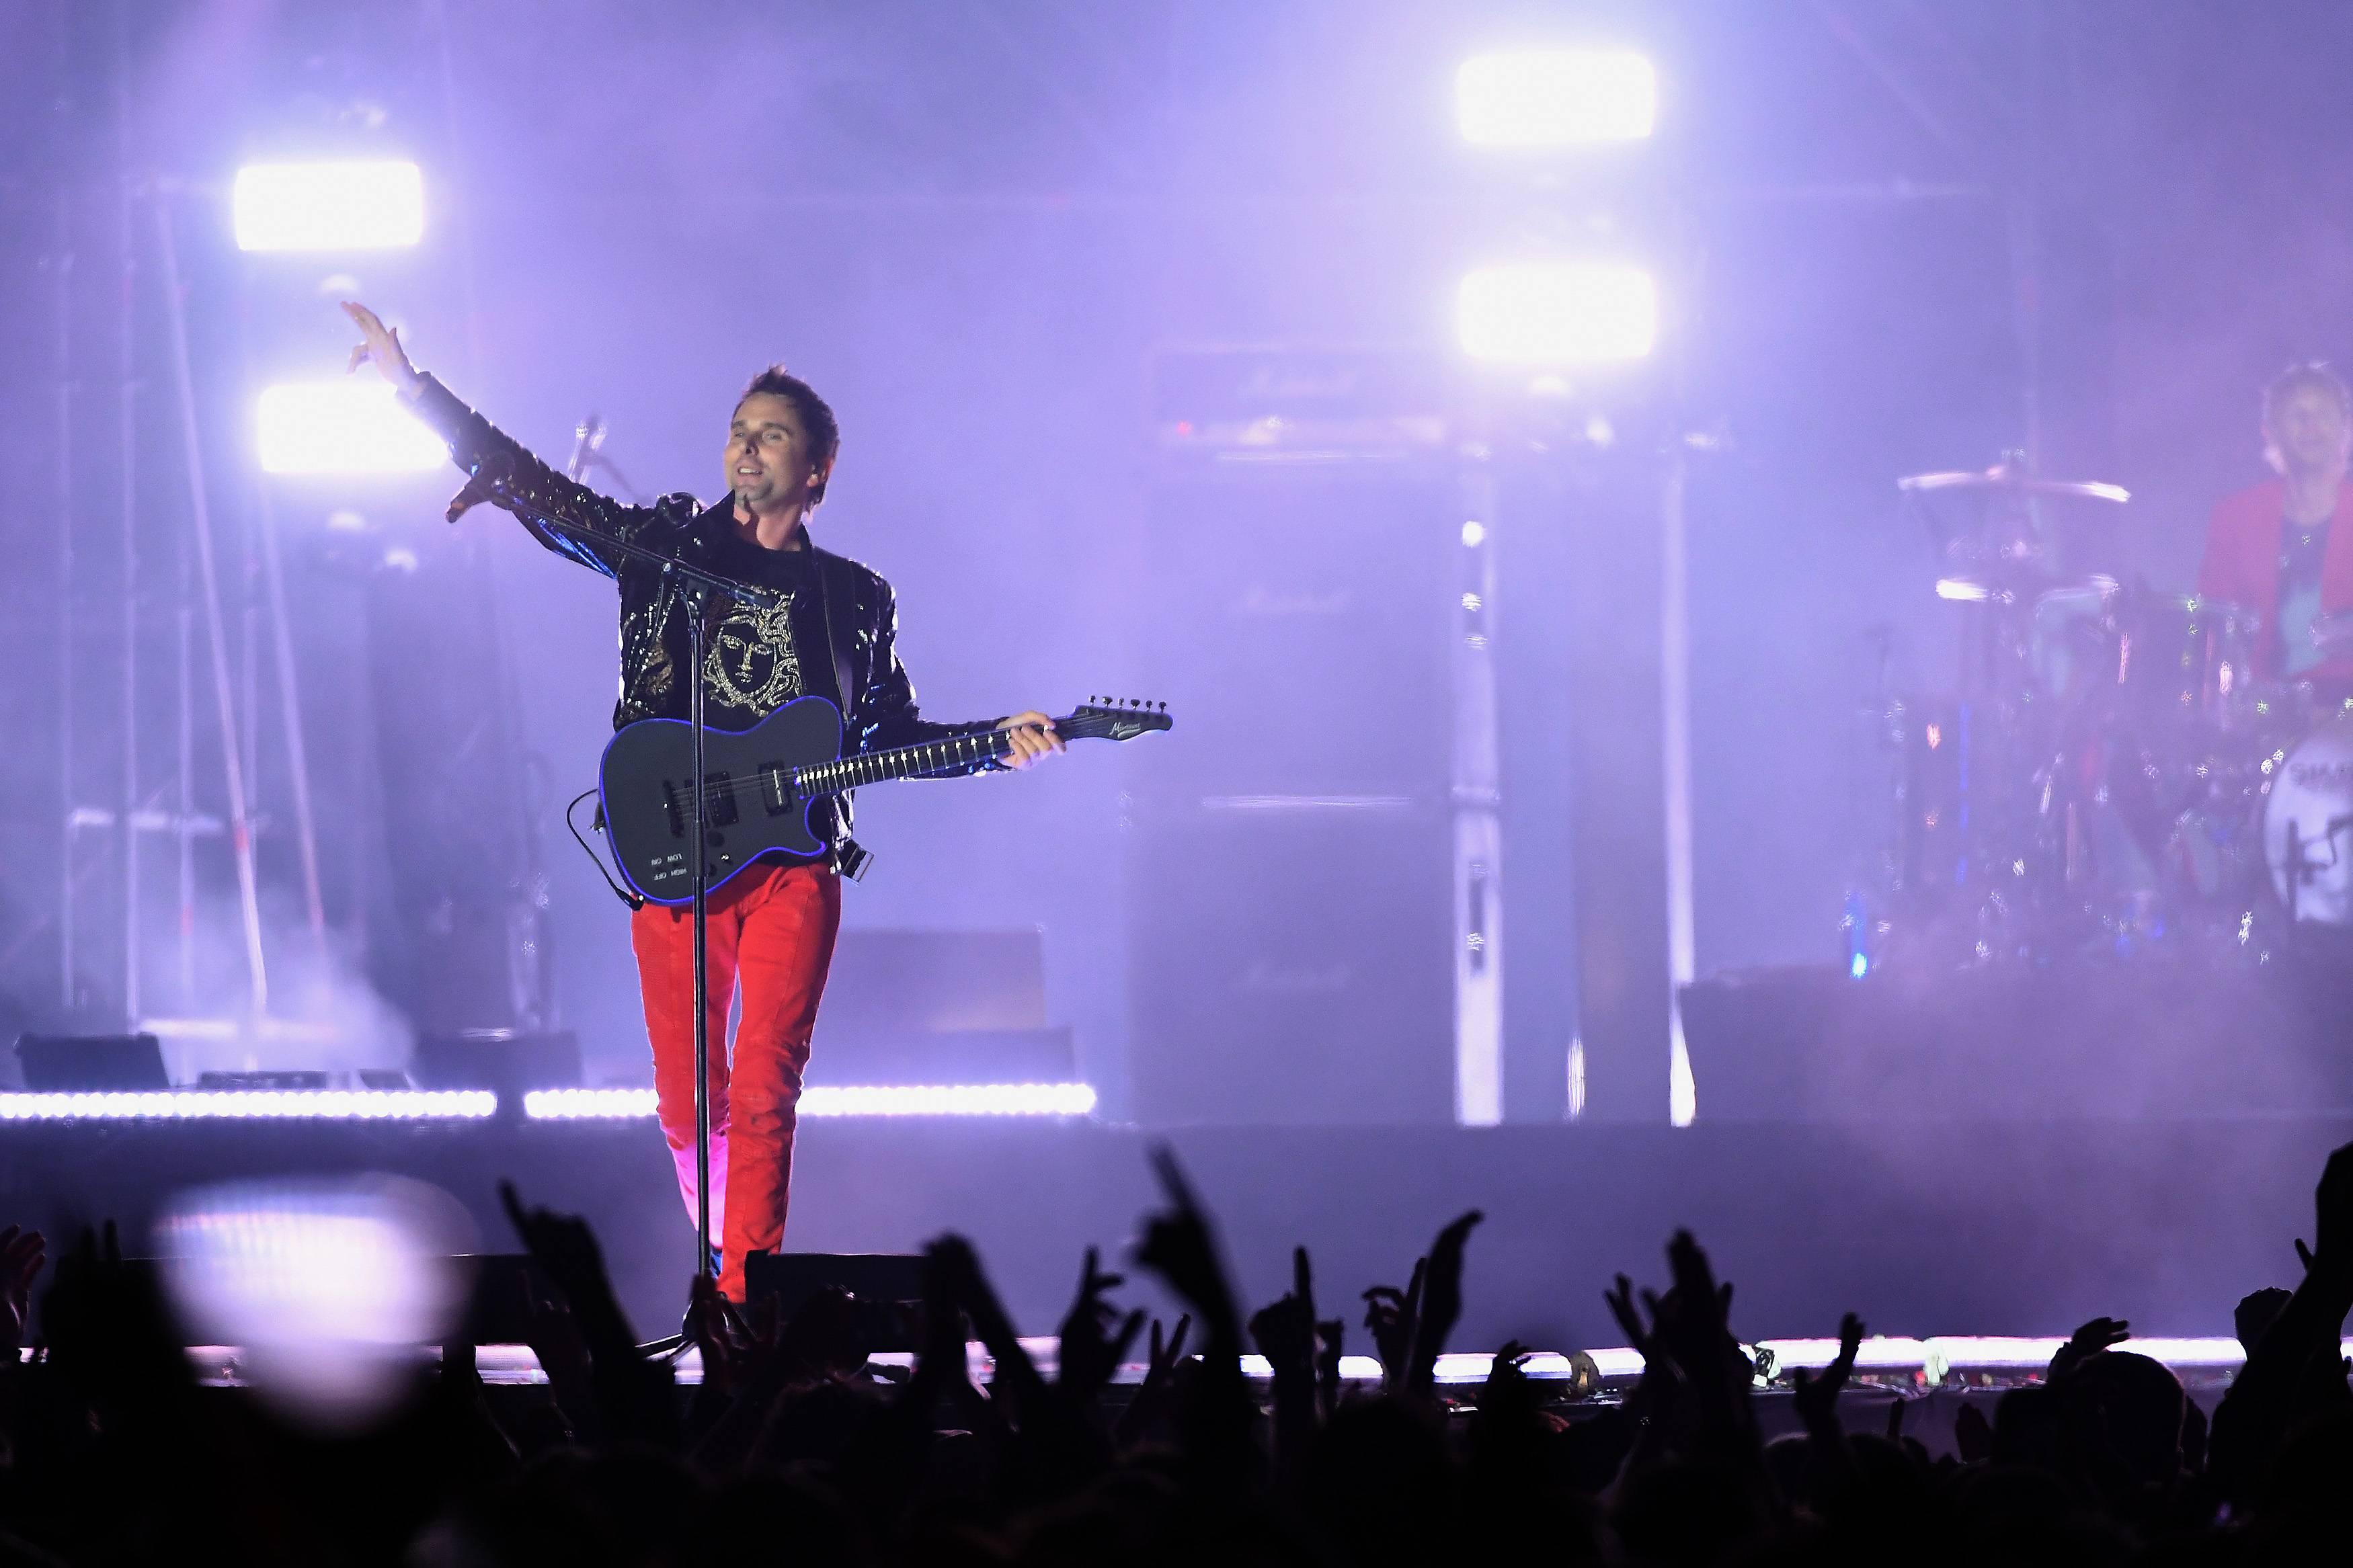 mgid:file:gsp:scenic:/international/mtv.es/images/Muse_-_MTV_World_Stage_-_MTV_EMAs_Bilbao_2018_-_22.JPG